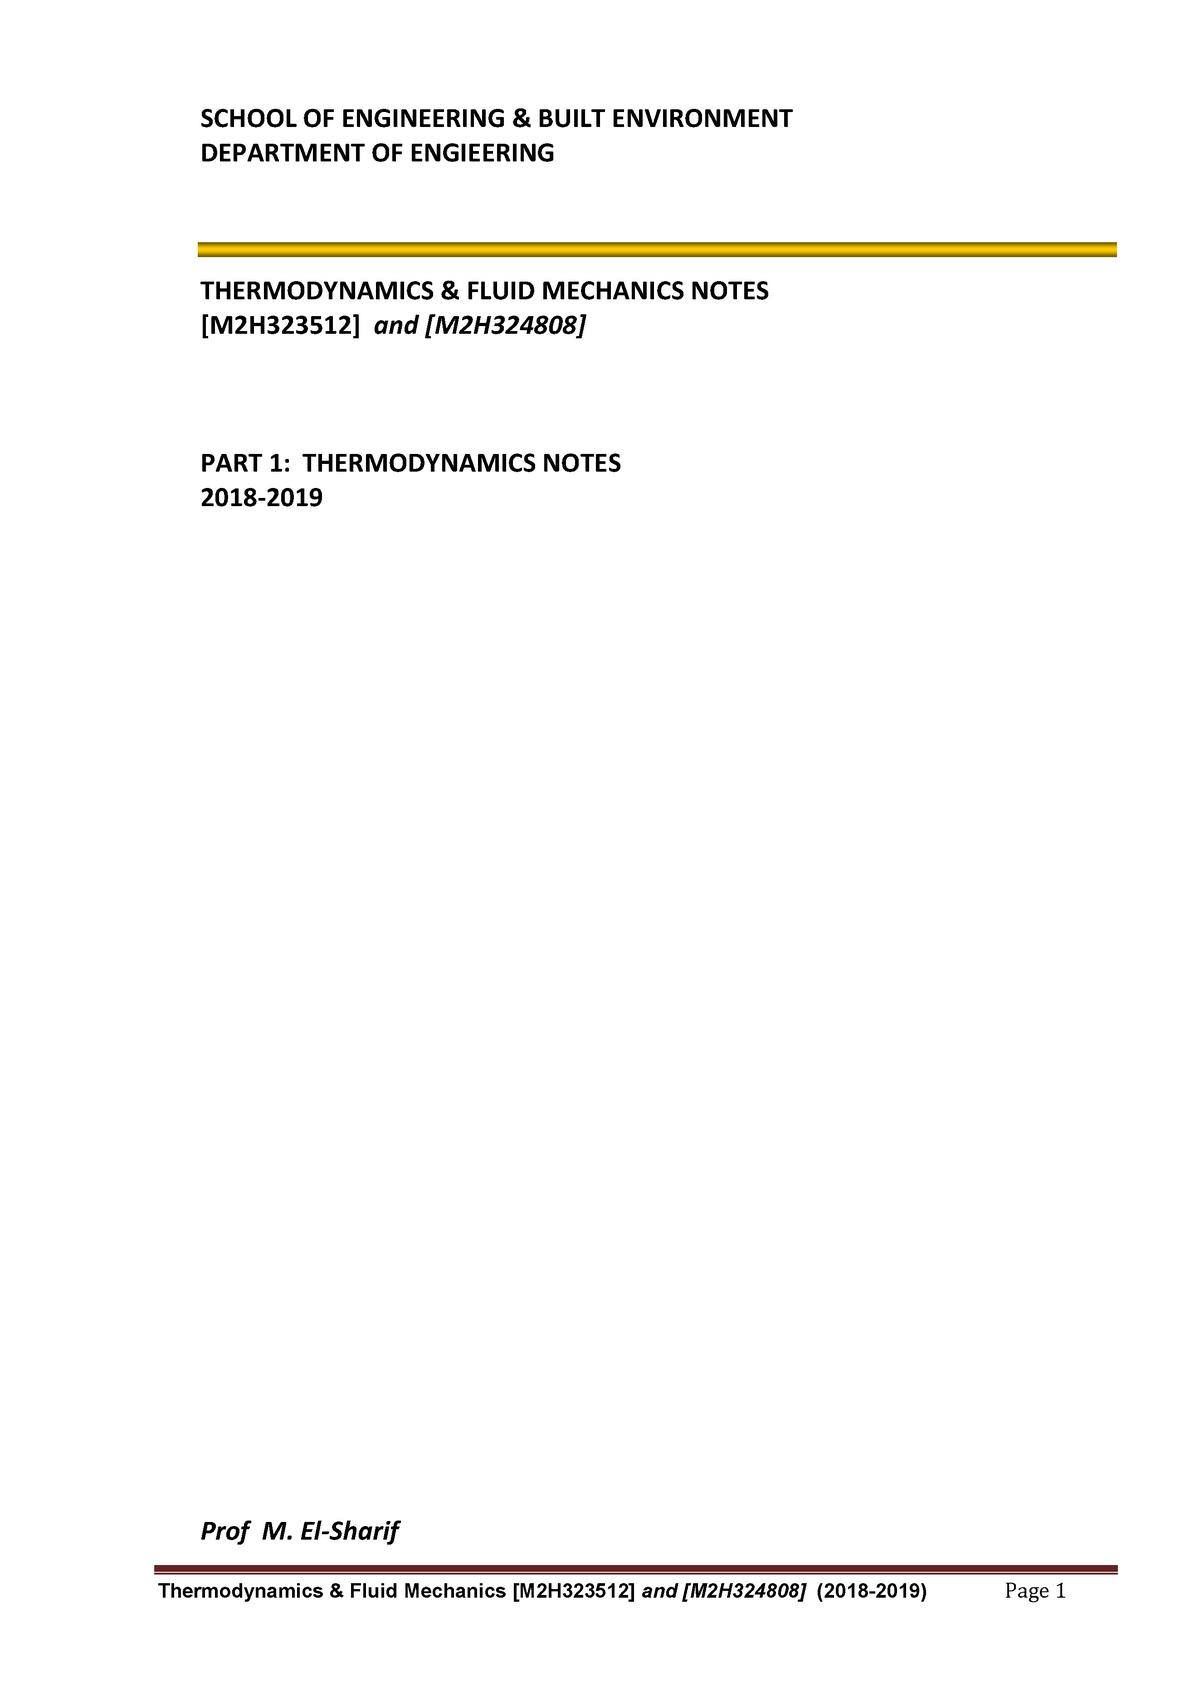 Part I - Thermodynamics Notes - M2H324808 - GCU - StuDocu